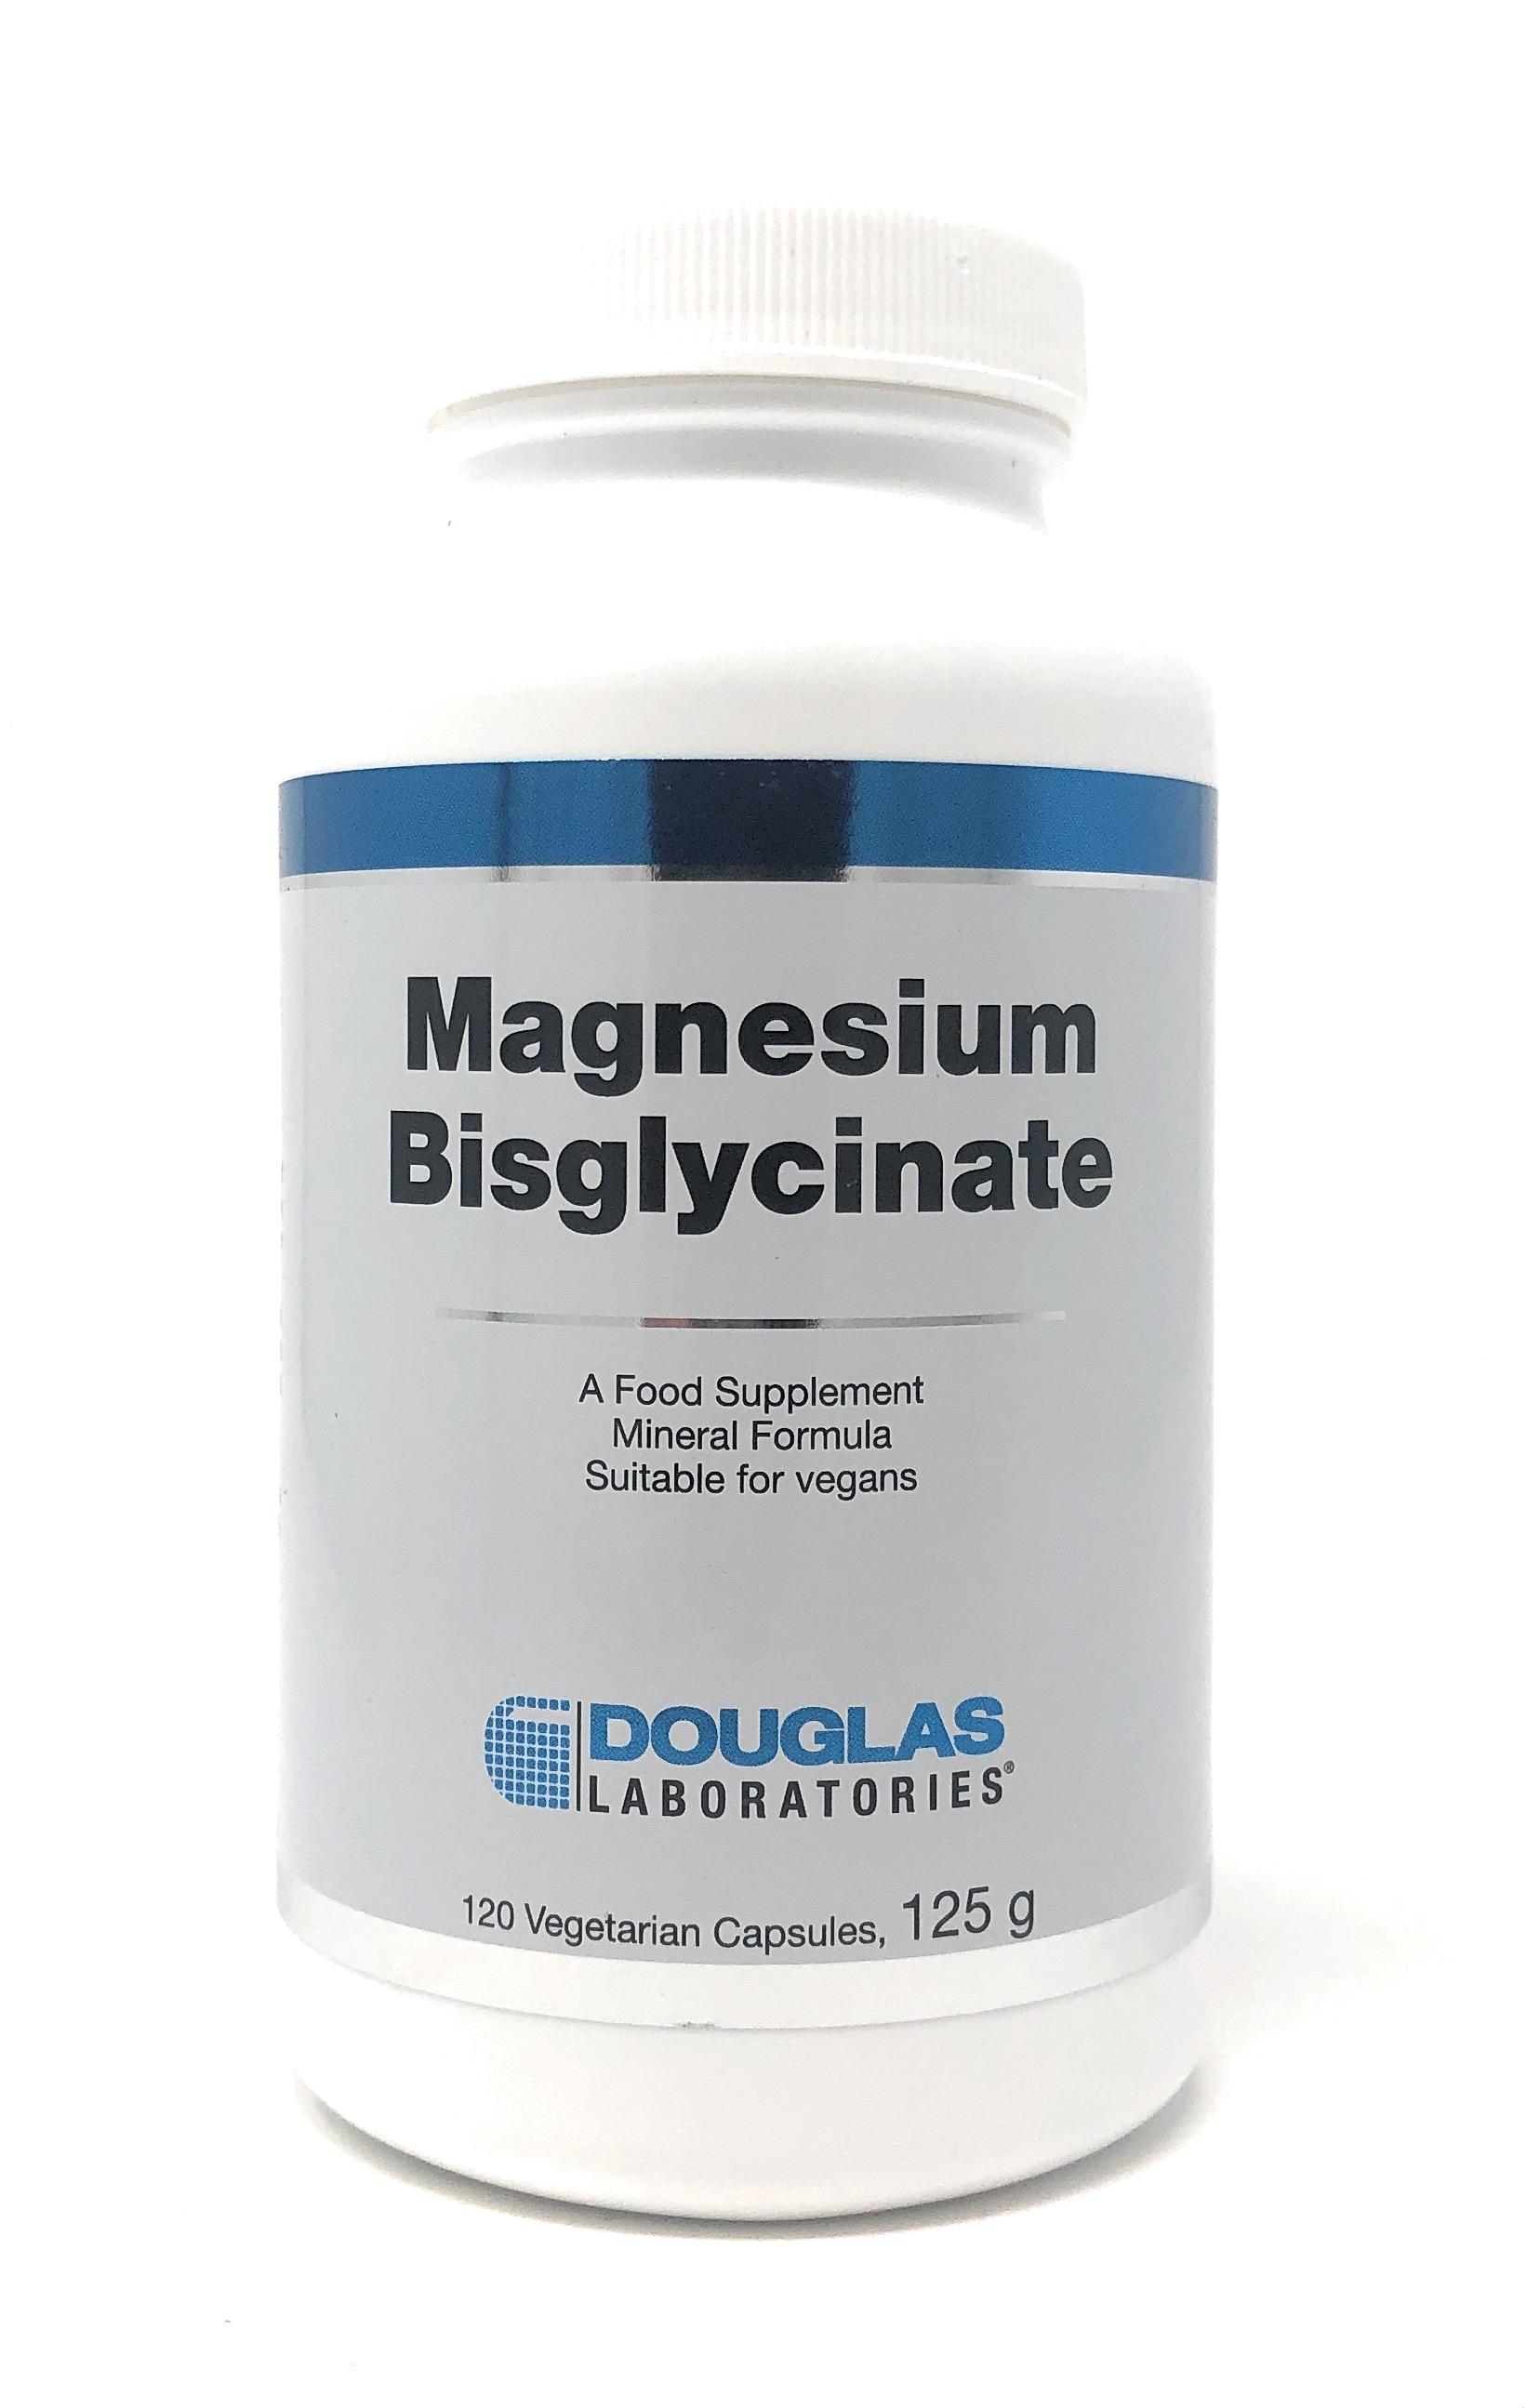 Douglas Laboratories Europe Magnesium Bisglycinate 120 veg. Kapseln (125g)